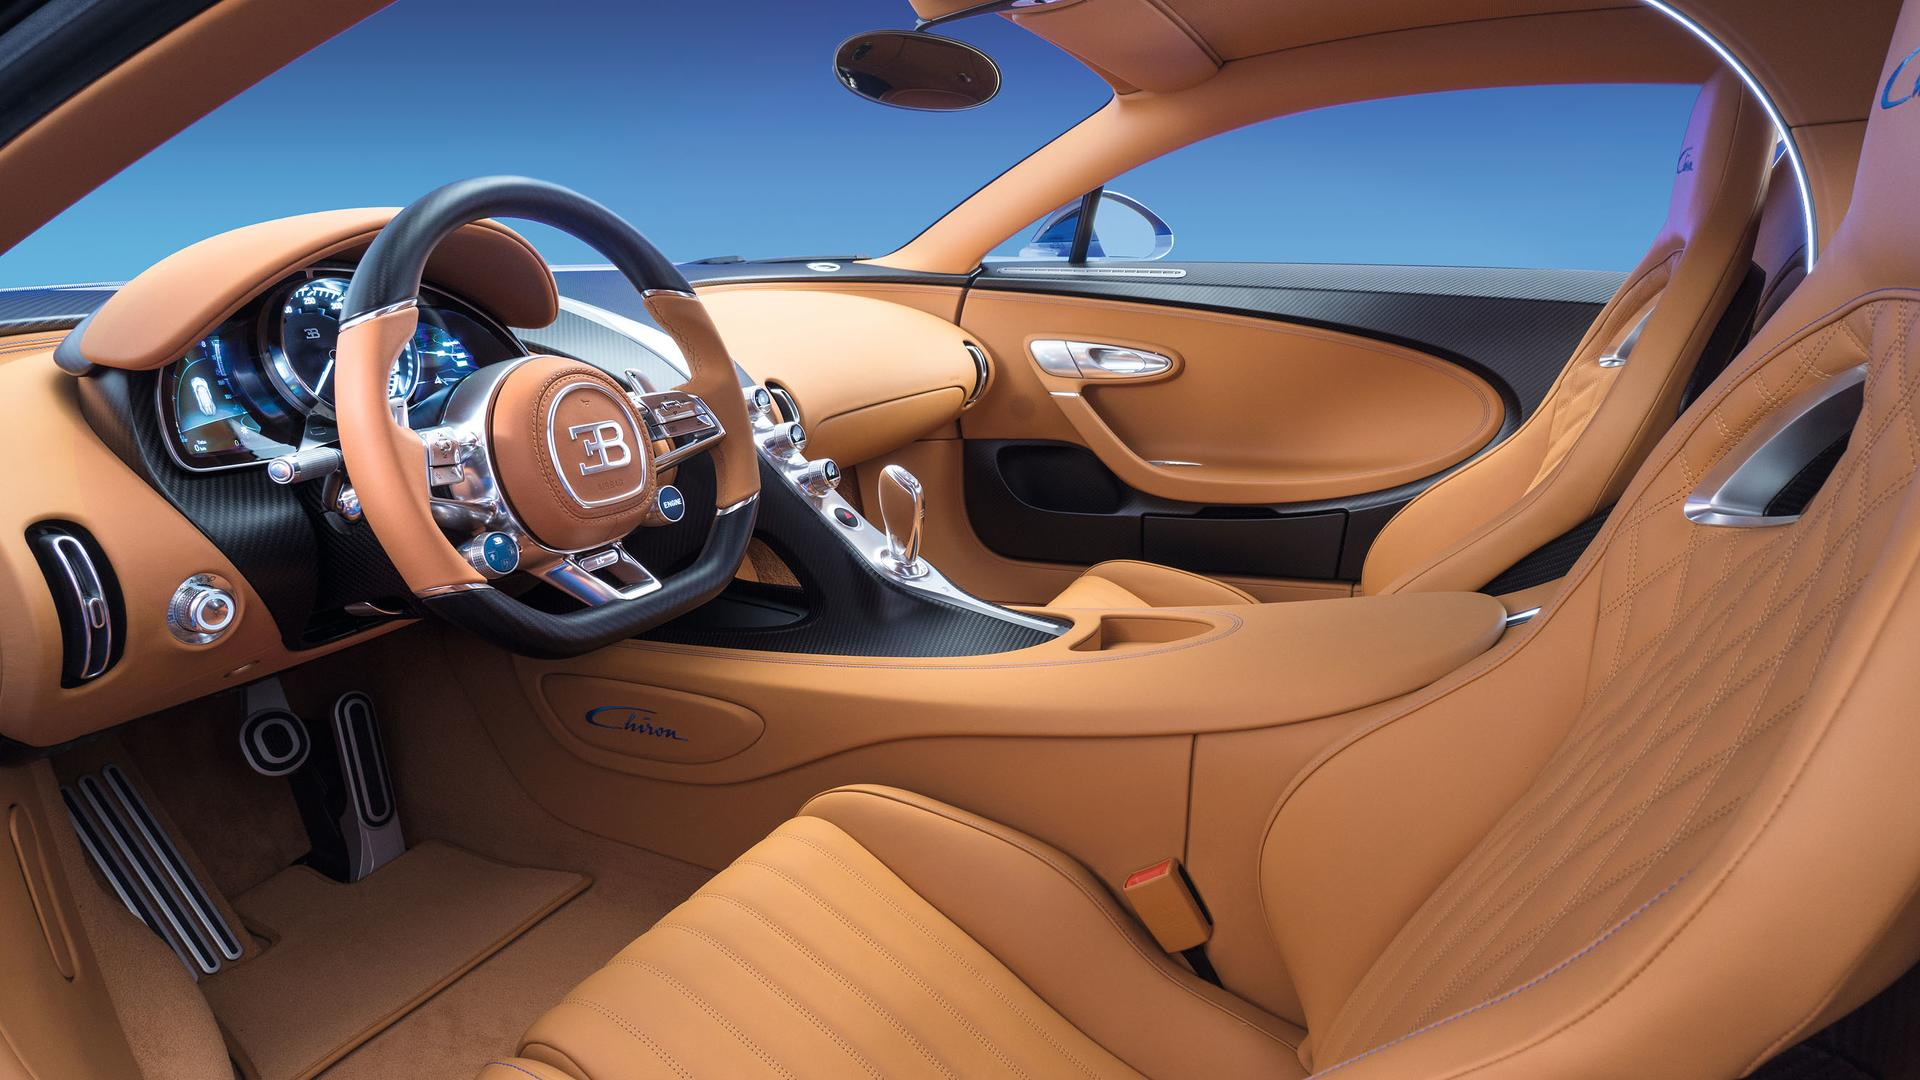 5a521a69349bf 2016 bugatti chiron بوگاتی چیرون نقد و بررسی   اجاره ماشین